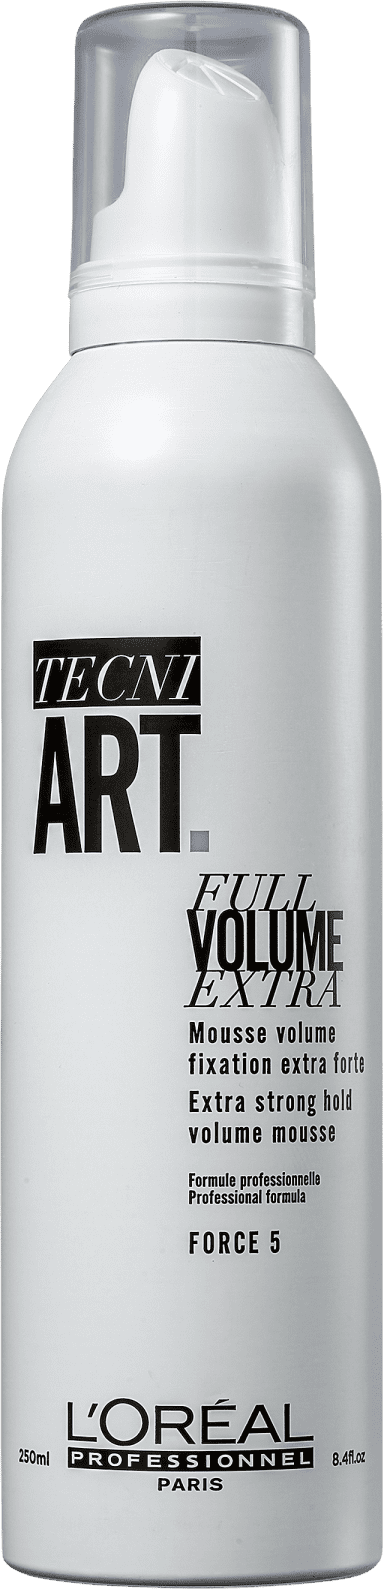 Finalizador Mousse Tecni Art Full Volume Extra Forte 250ml L